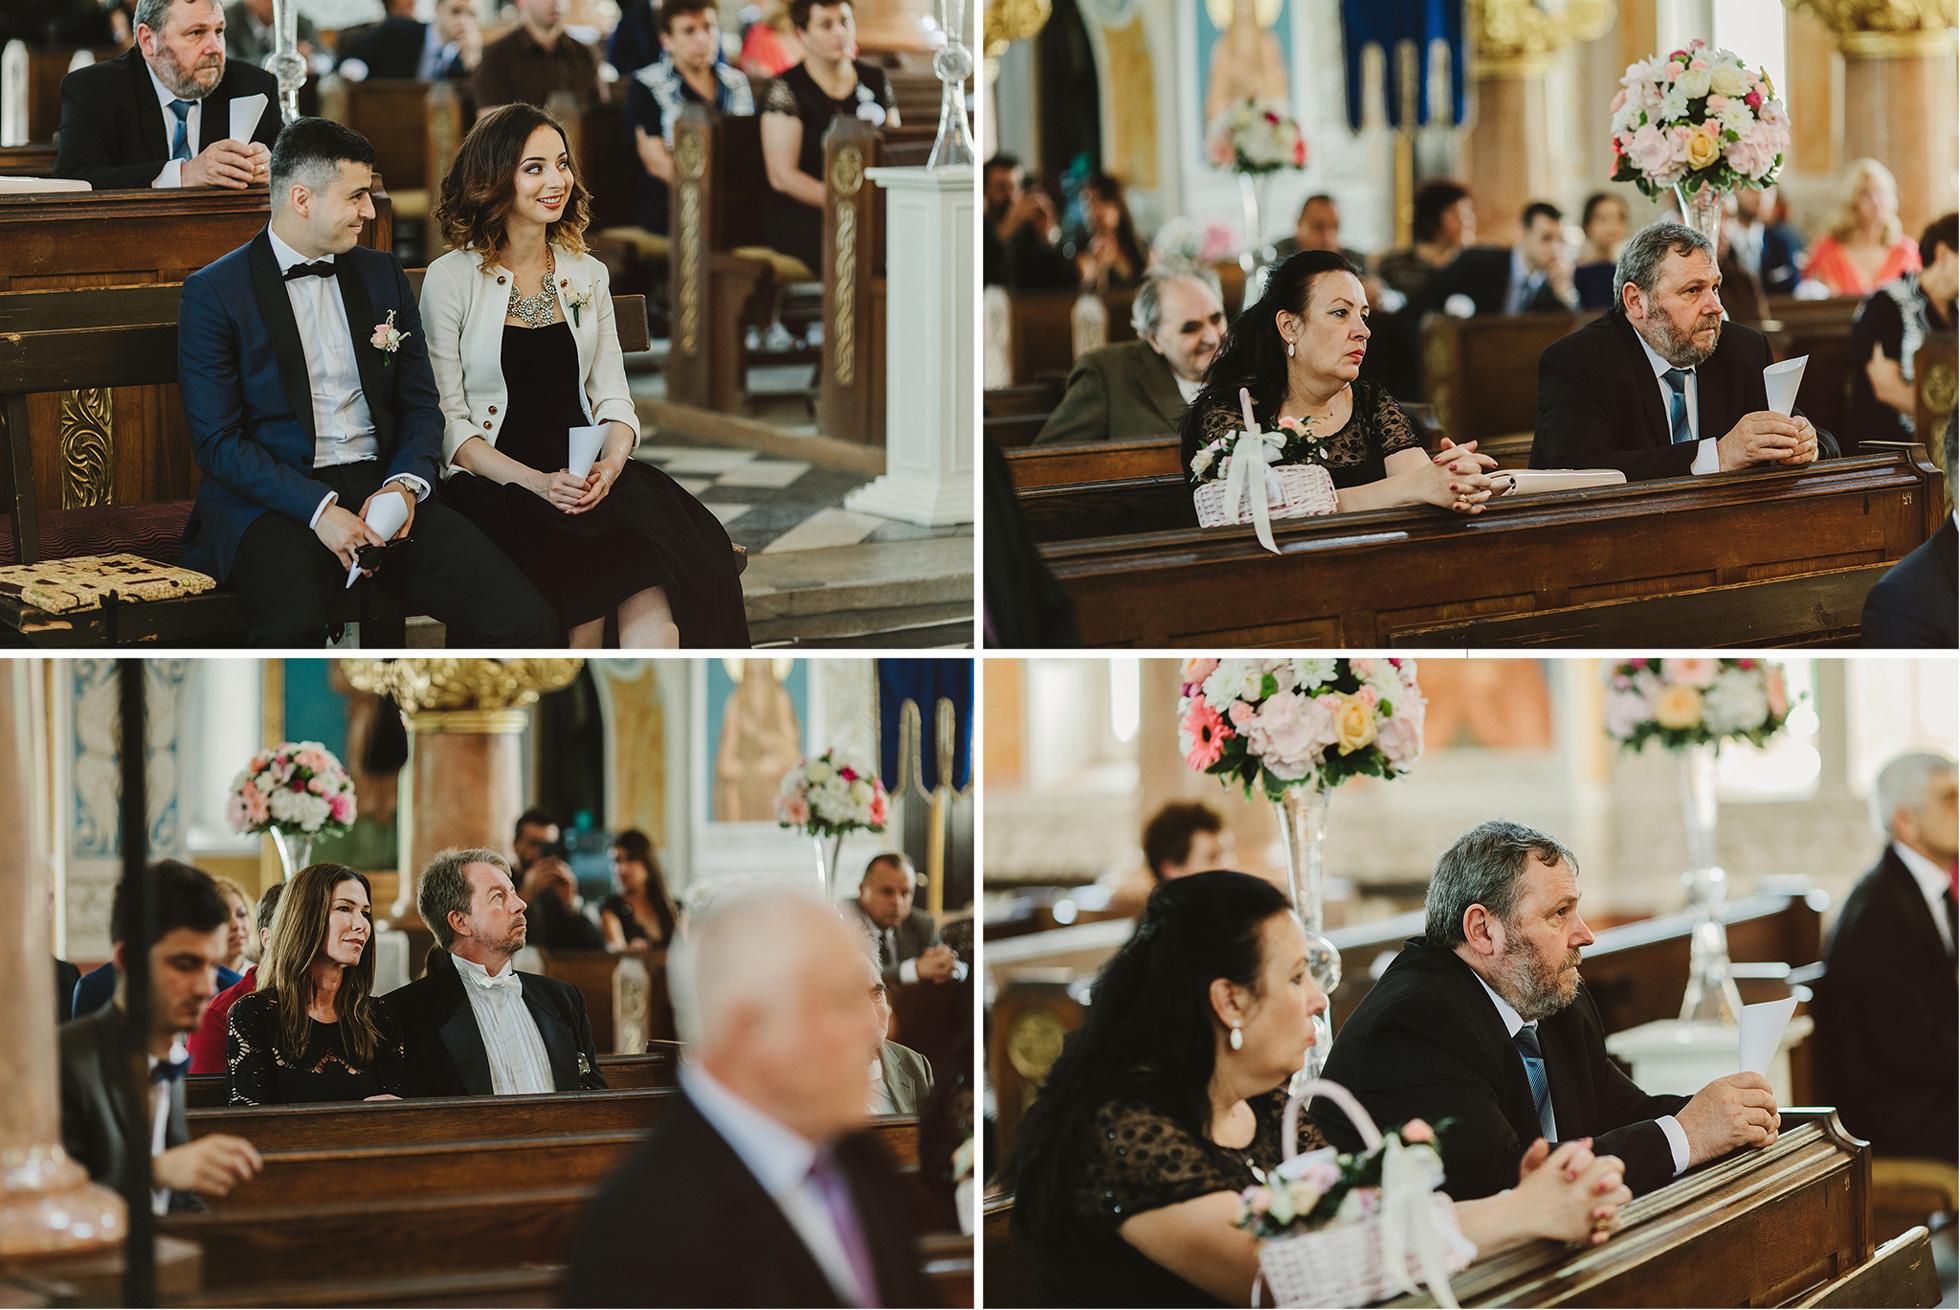 Liana-+-Florin-{wedding}-092